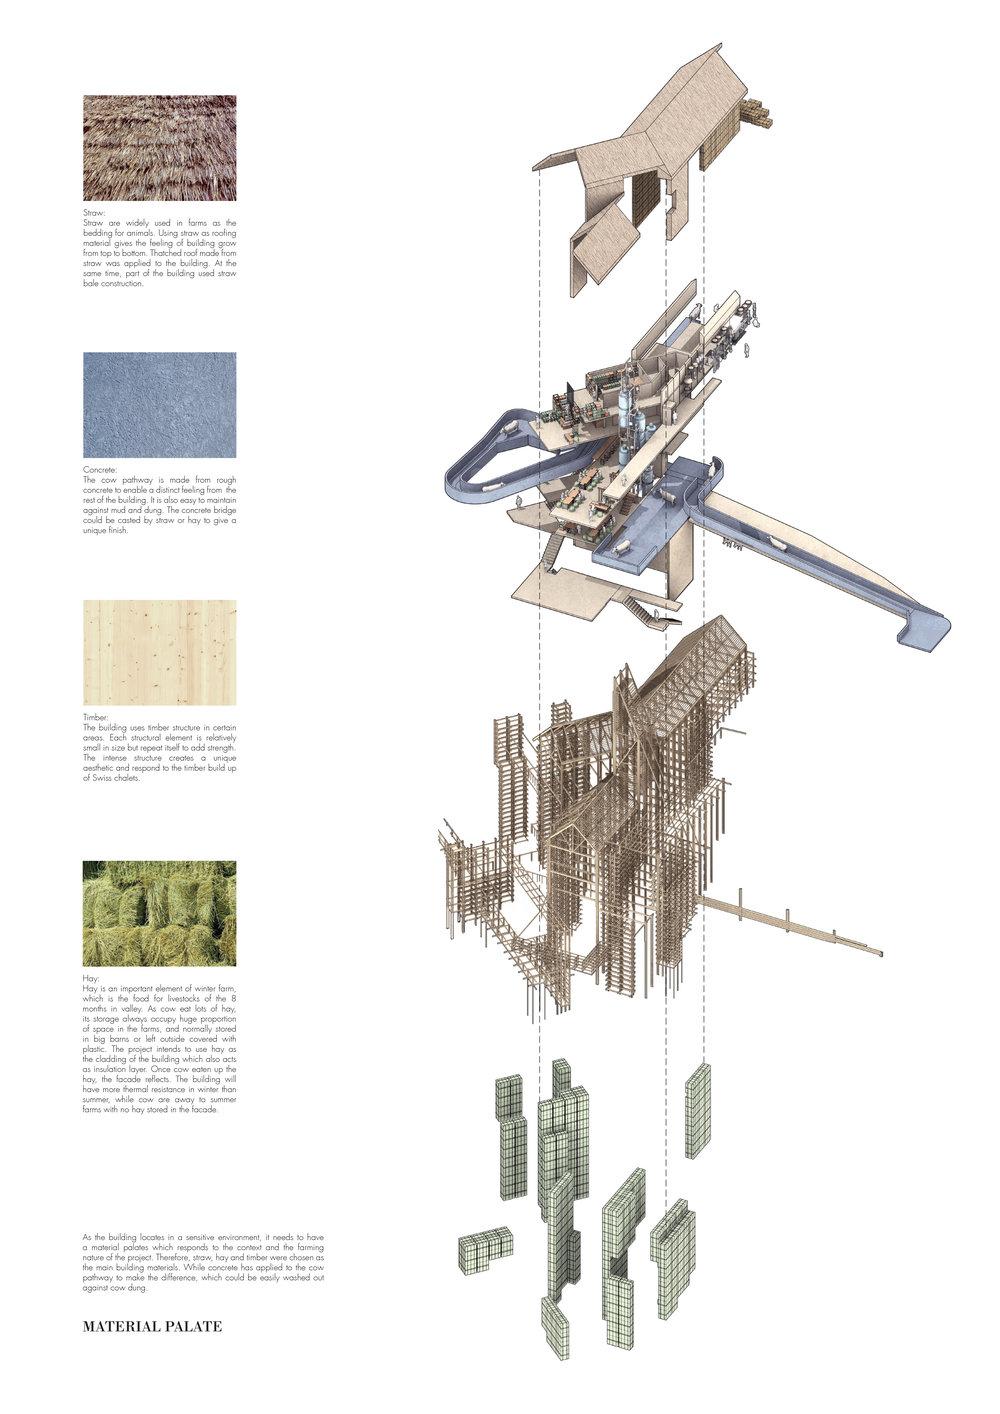 Scott Siqi Chen Y4 Smout Allen In 2020 Diagram Architecture Bartlett School Of Architecture Architecture Concept Drawings